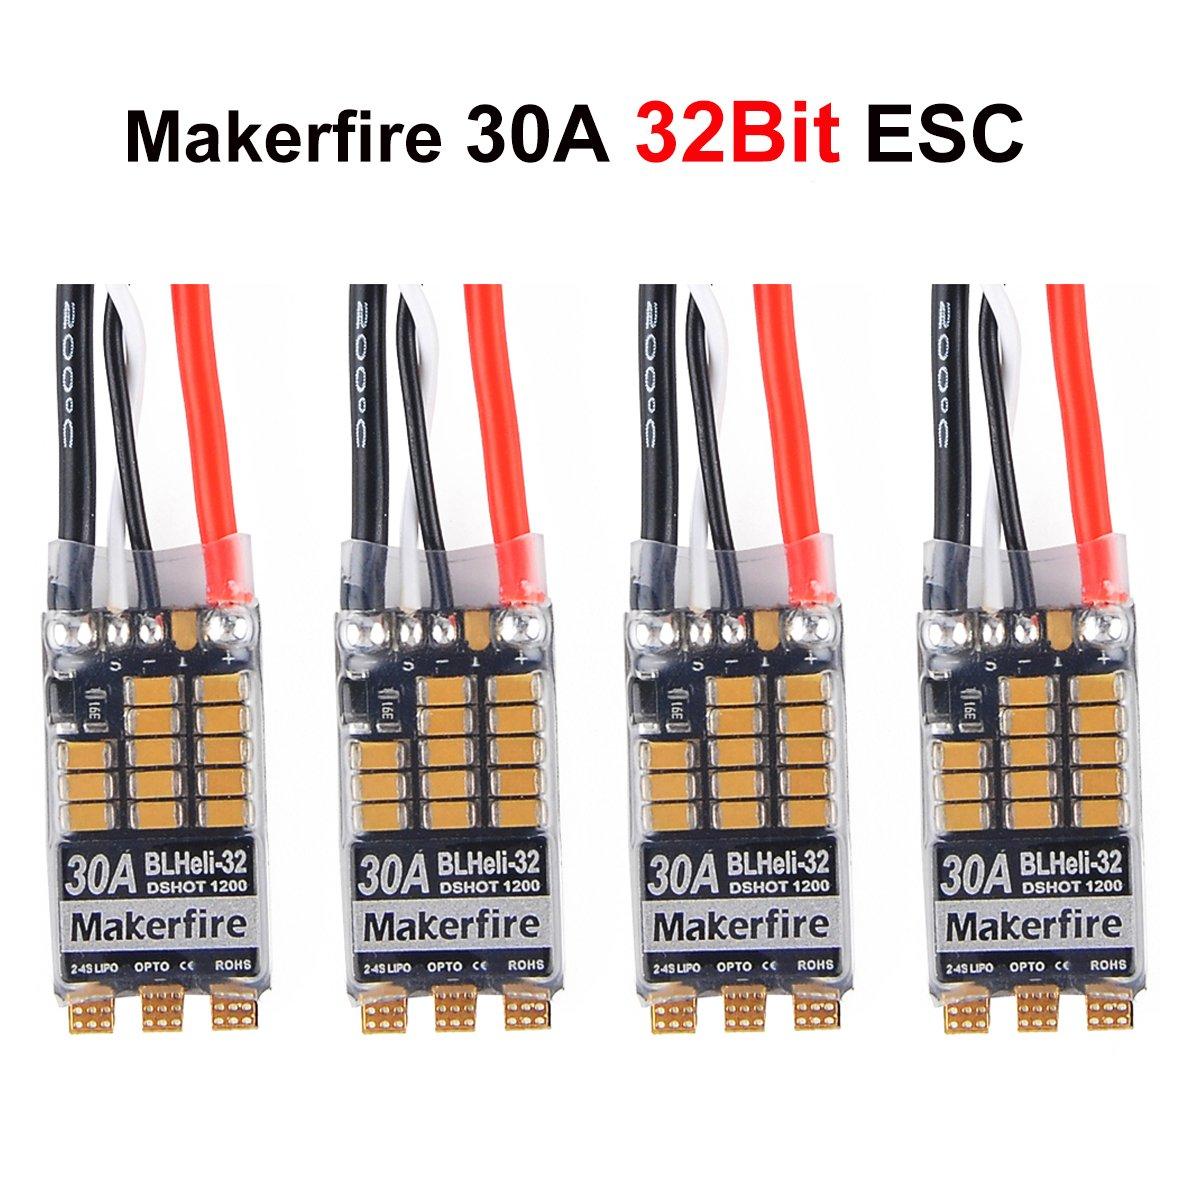 Maker Fire Esc Wiring Trusted Diagram Brushless Amazon Com Makerfire 4pcs Blheli 32 32bit 30a Bec